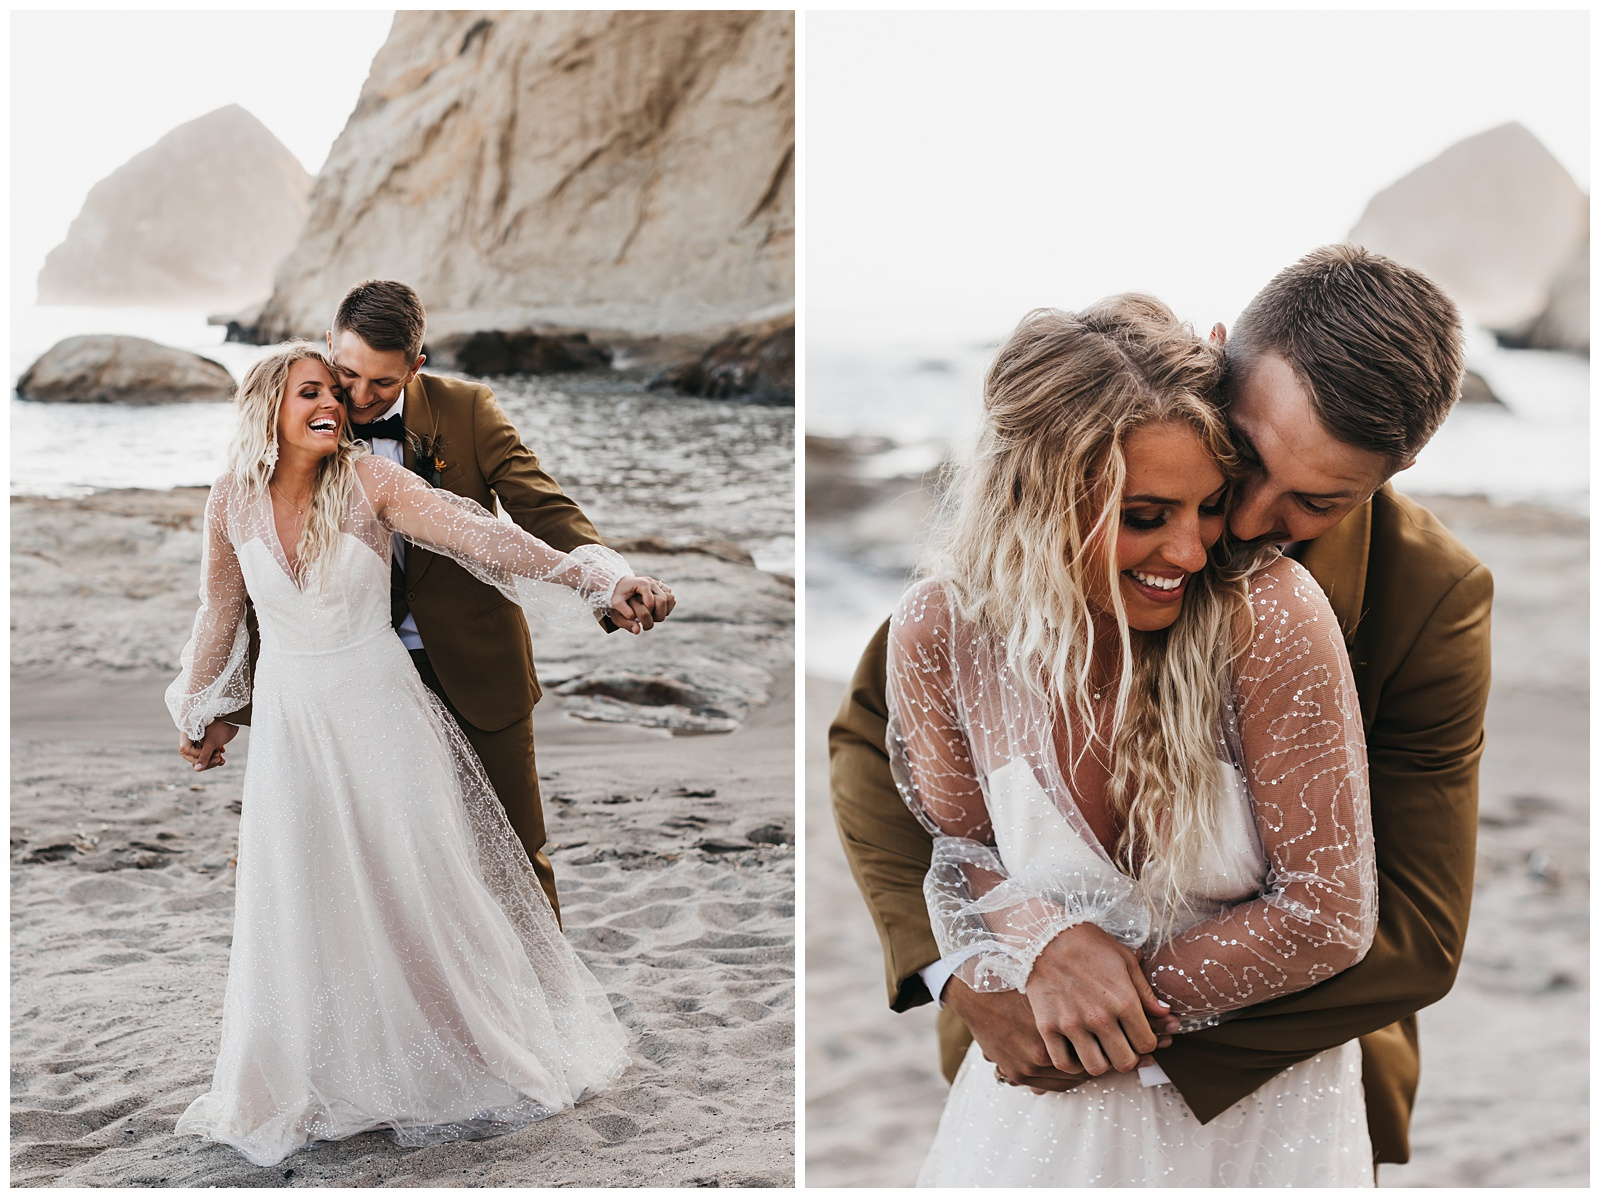 portland-wedding-photographer-pacific-city-elopement-photographer-anniezav_0025.jpg